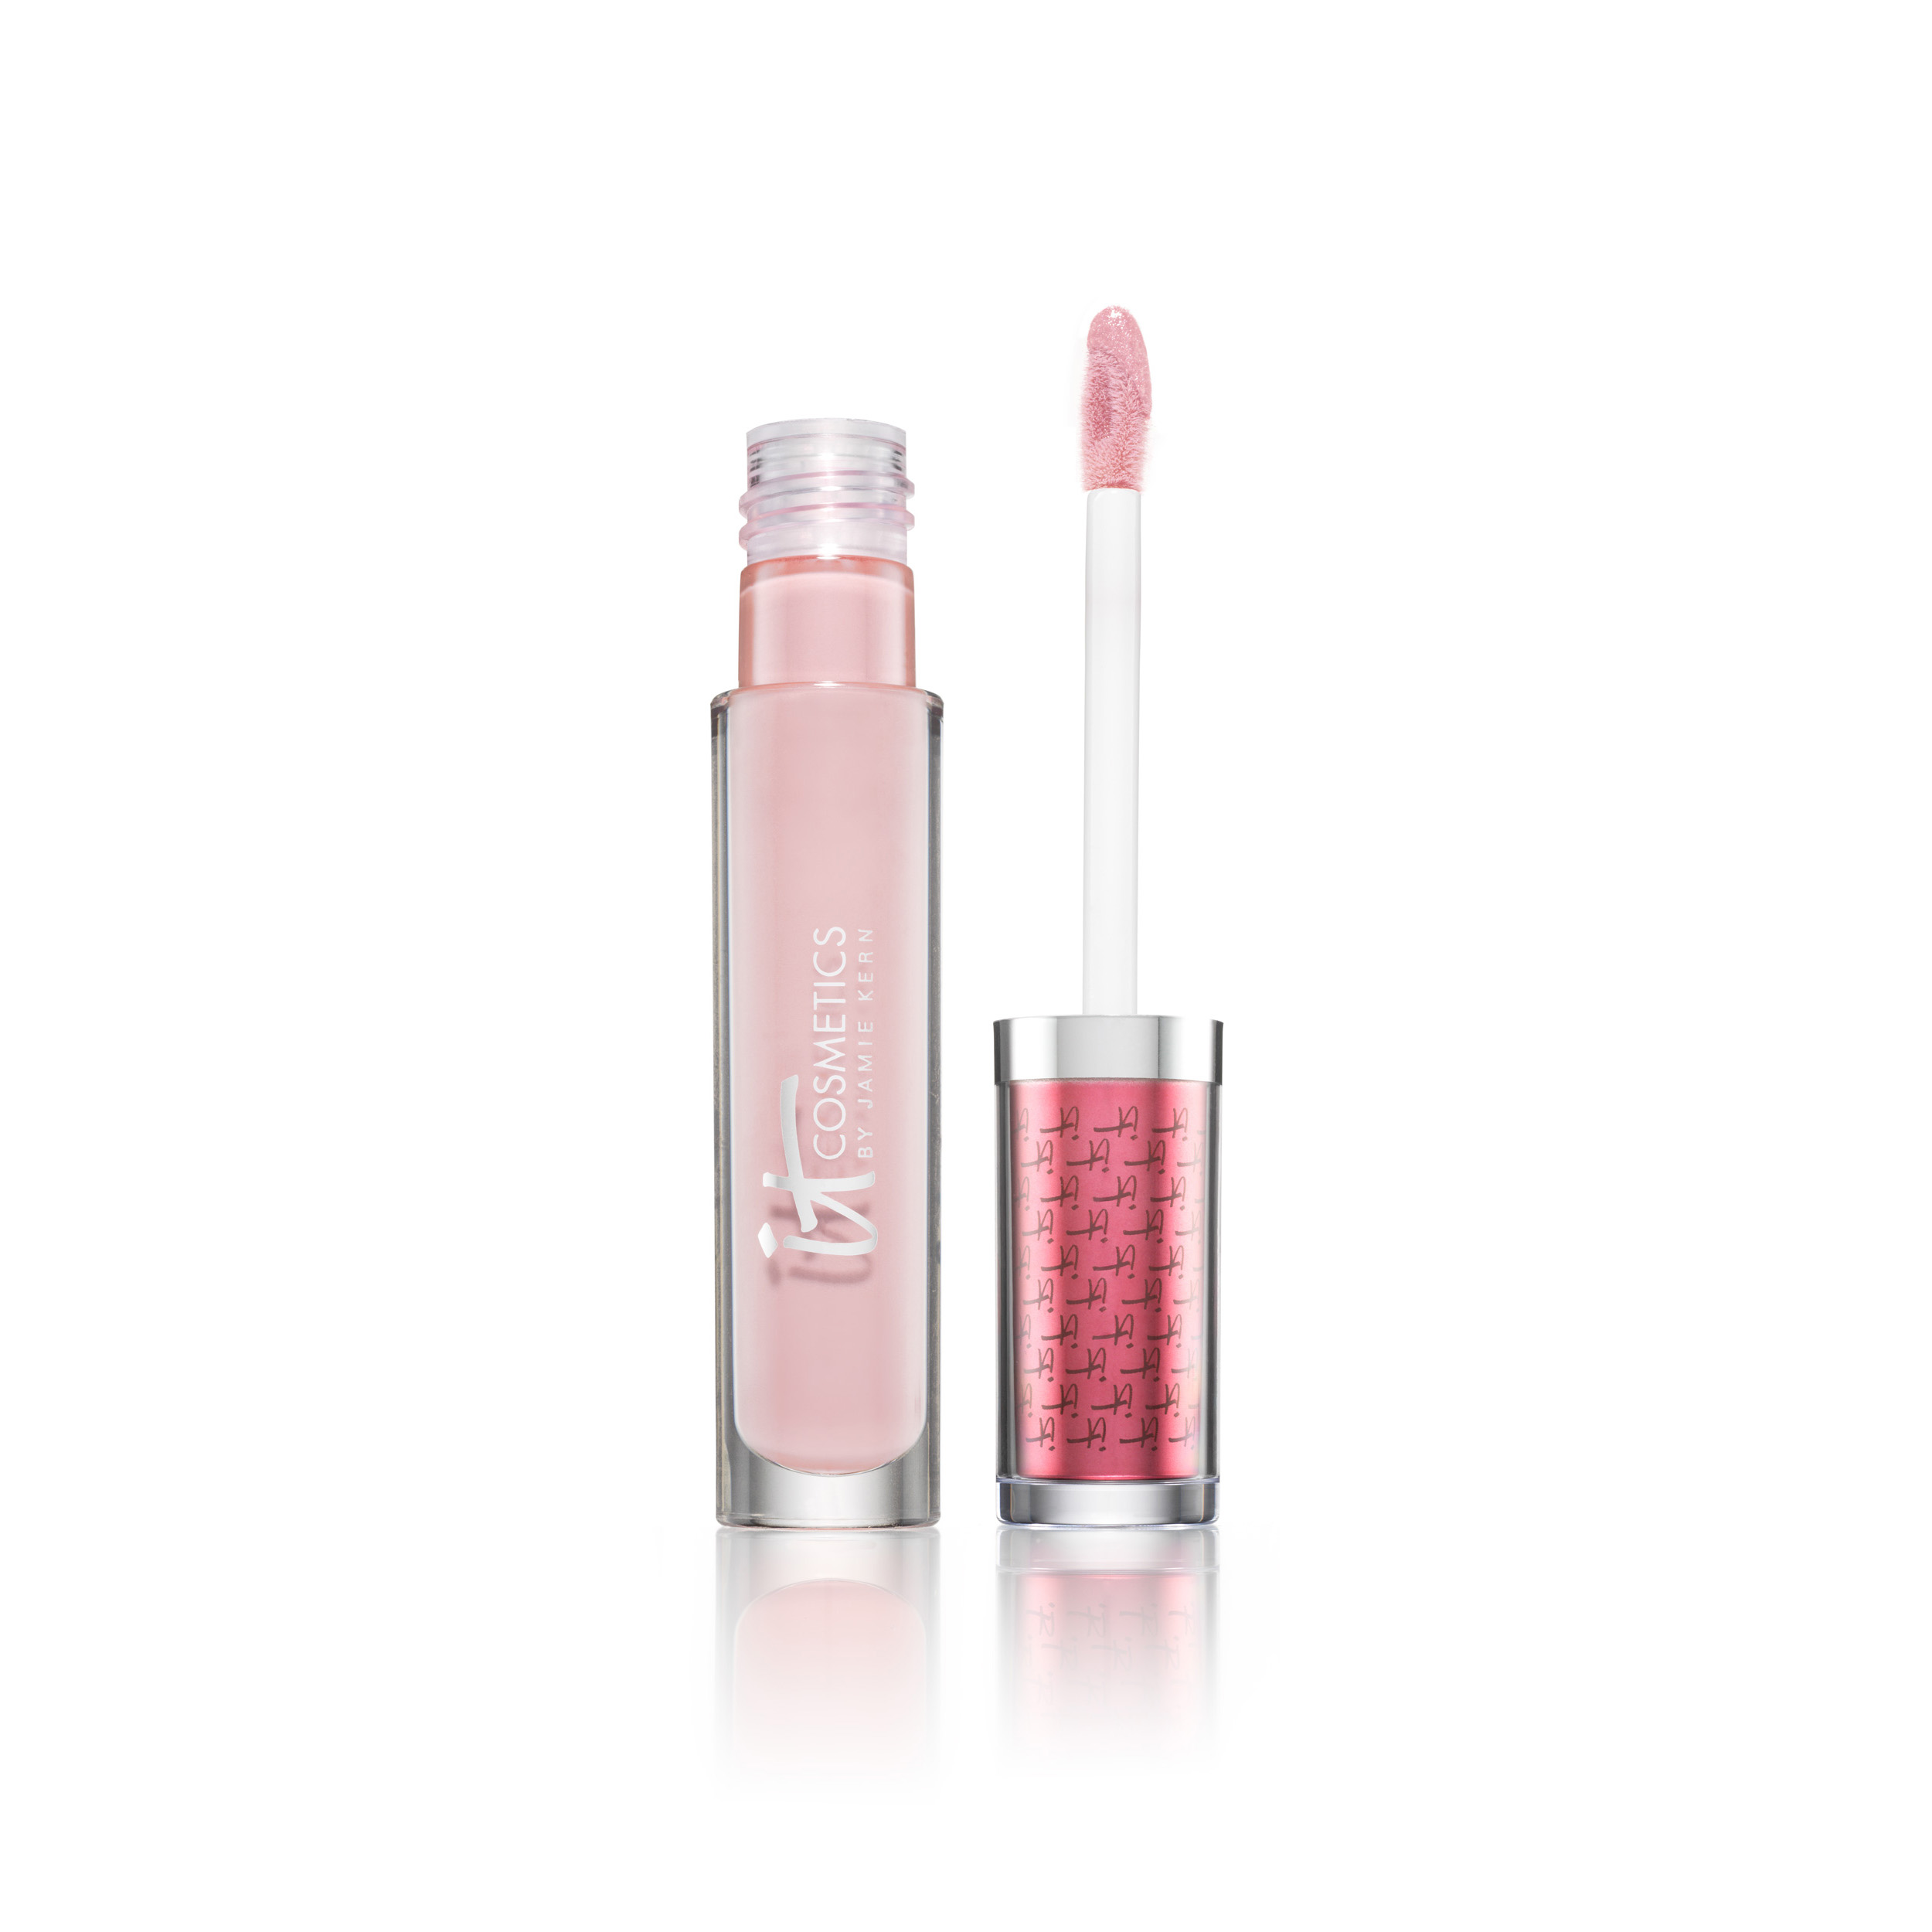 Vitality Lip Flush Stain™ Hydrating Serum Gloss Stain Je Ne Sais Quoi